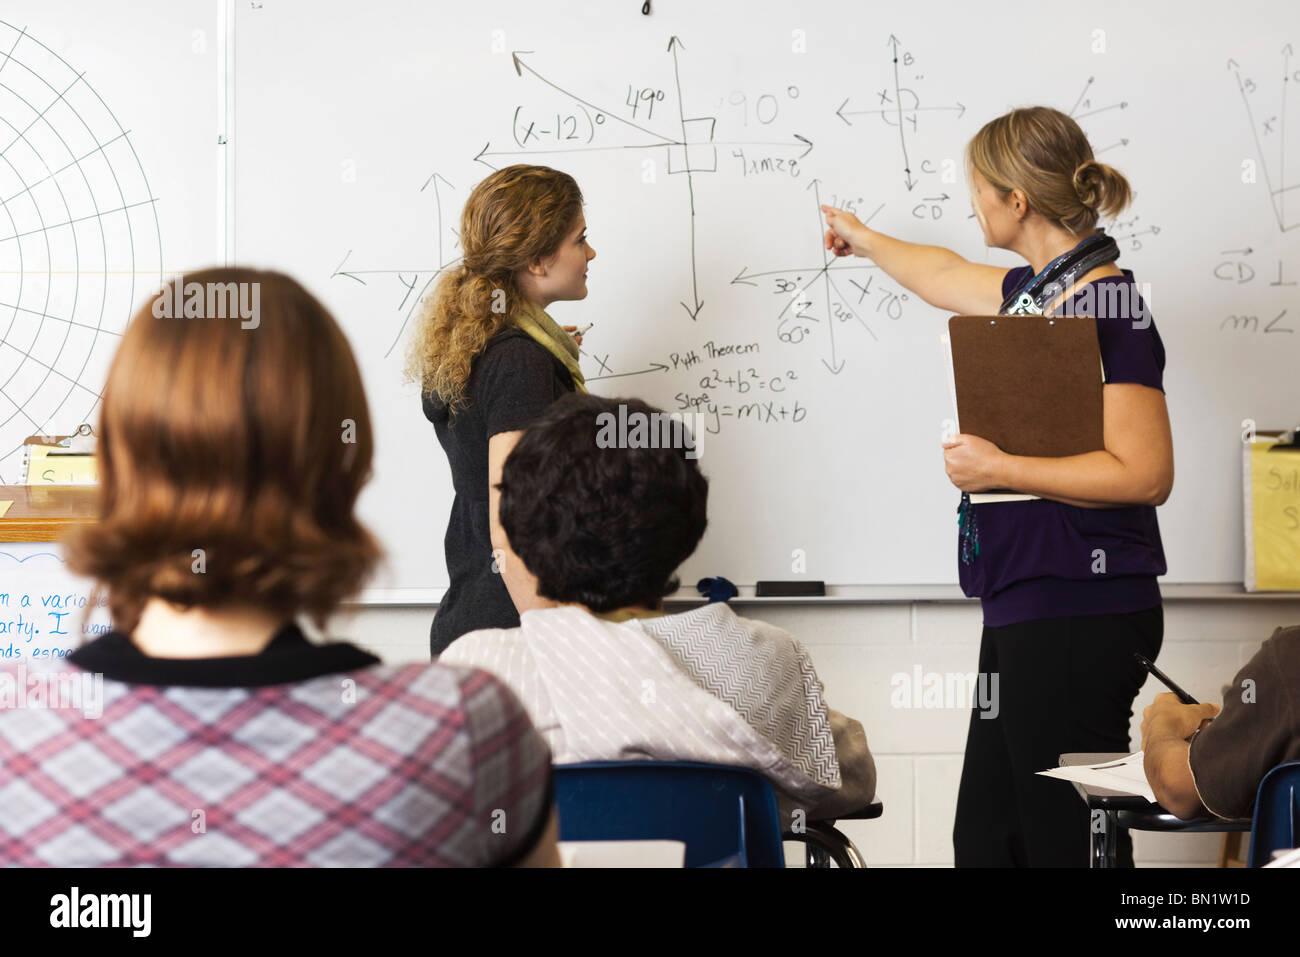 High school math class - Stock Image